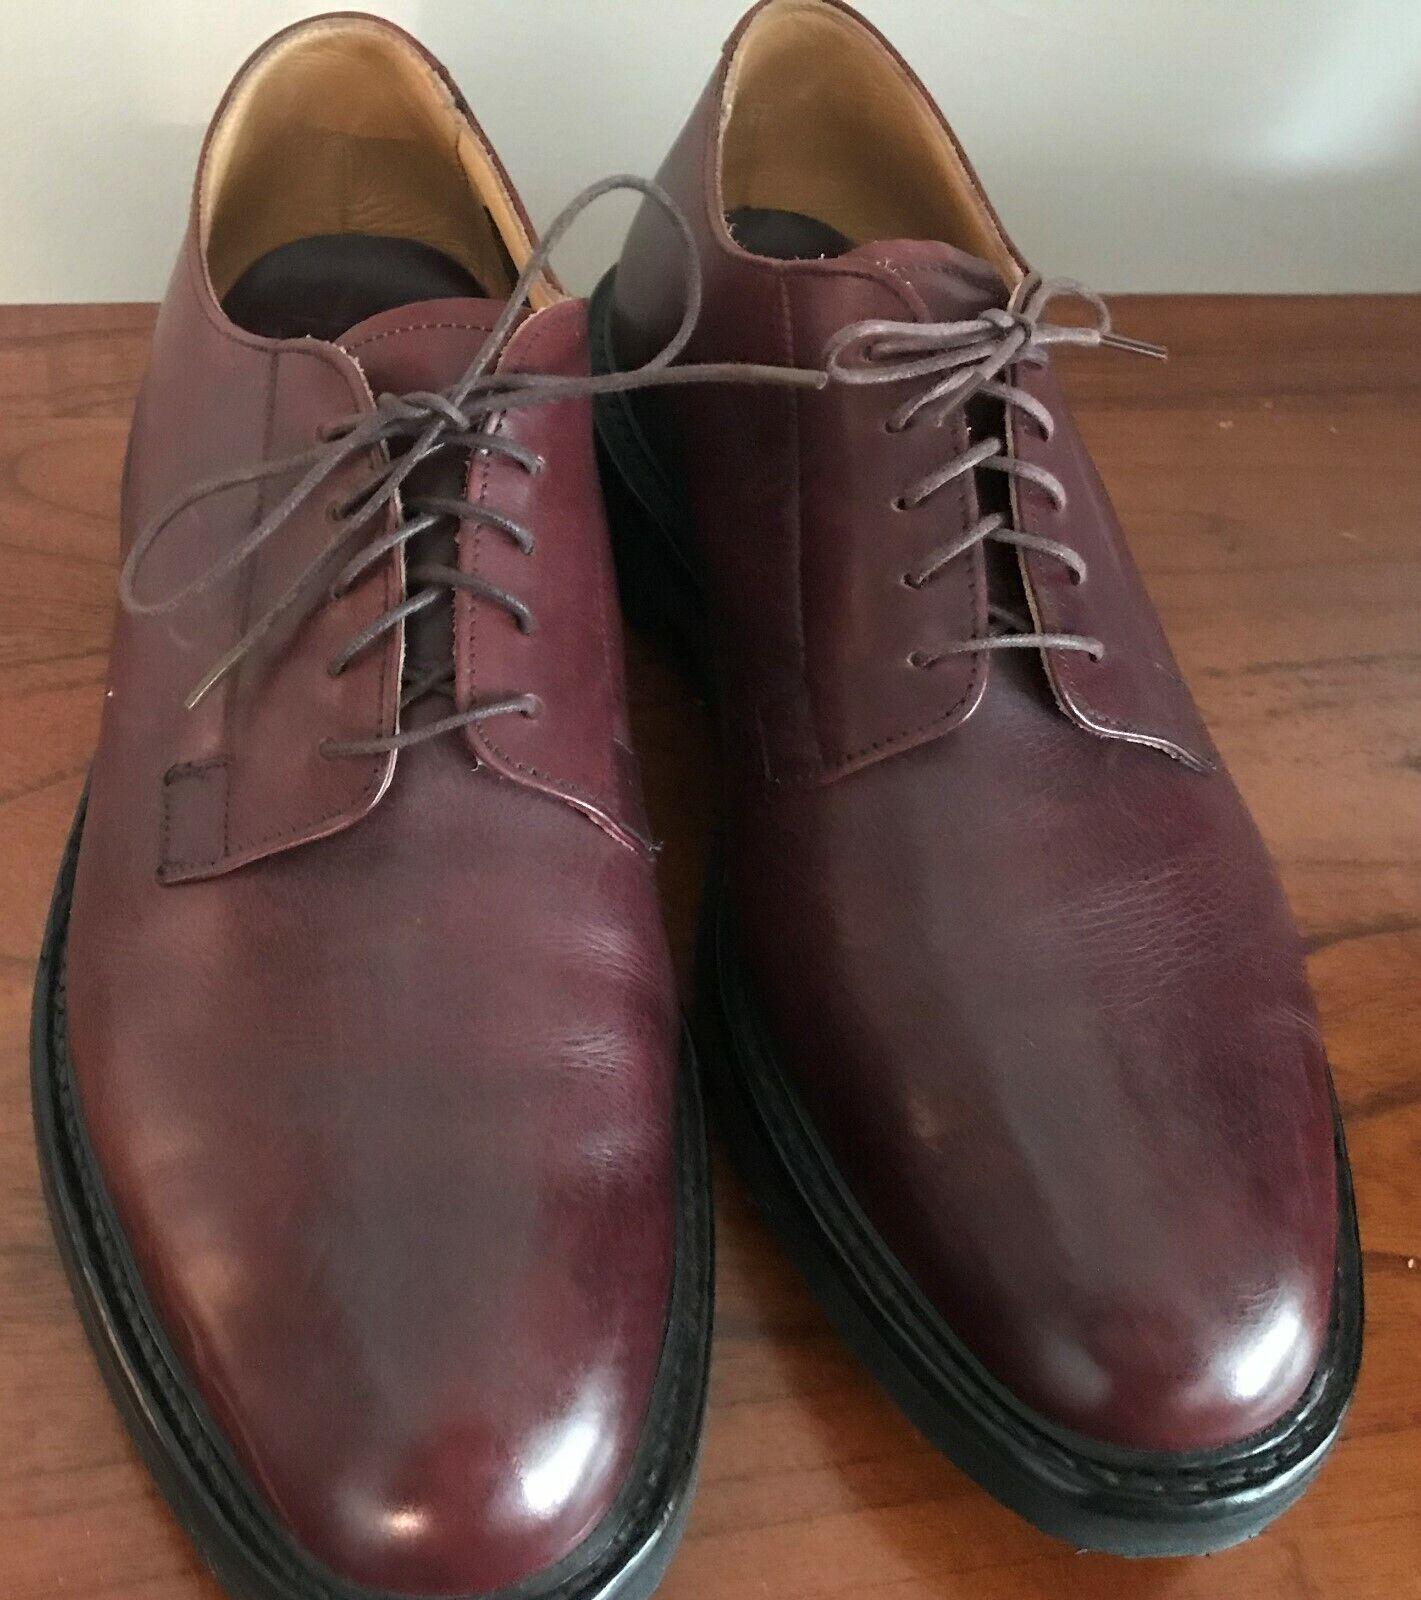 Zapatos De Vestir Barrie Ltd de Inglaterra Artesanal (hombre) Talla 10 Marrón Derby